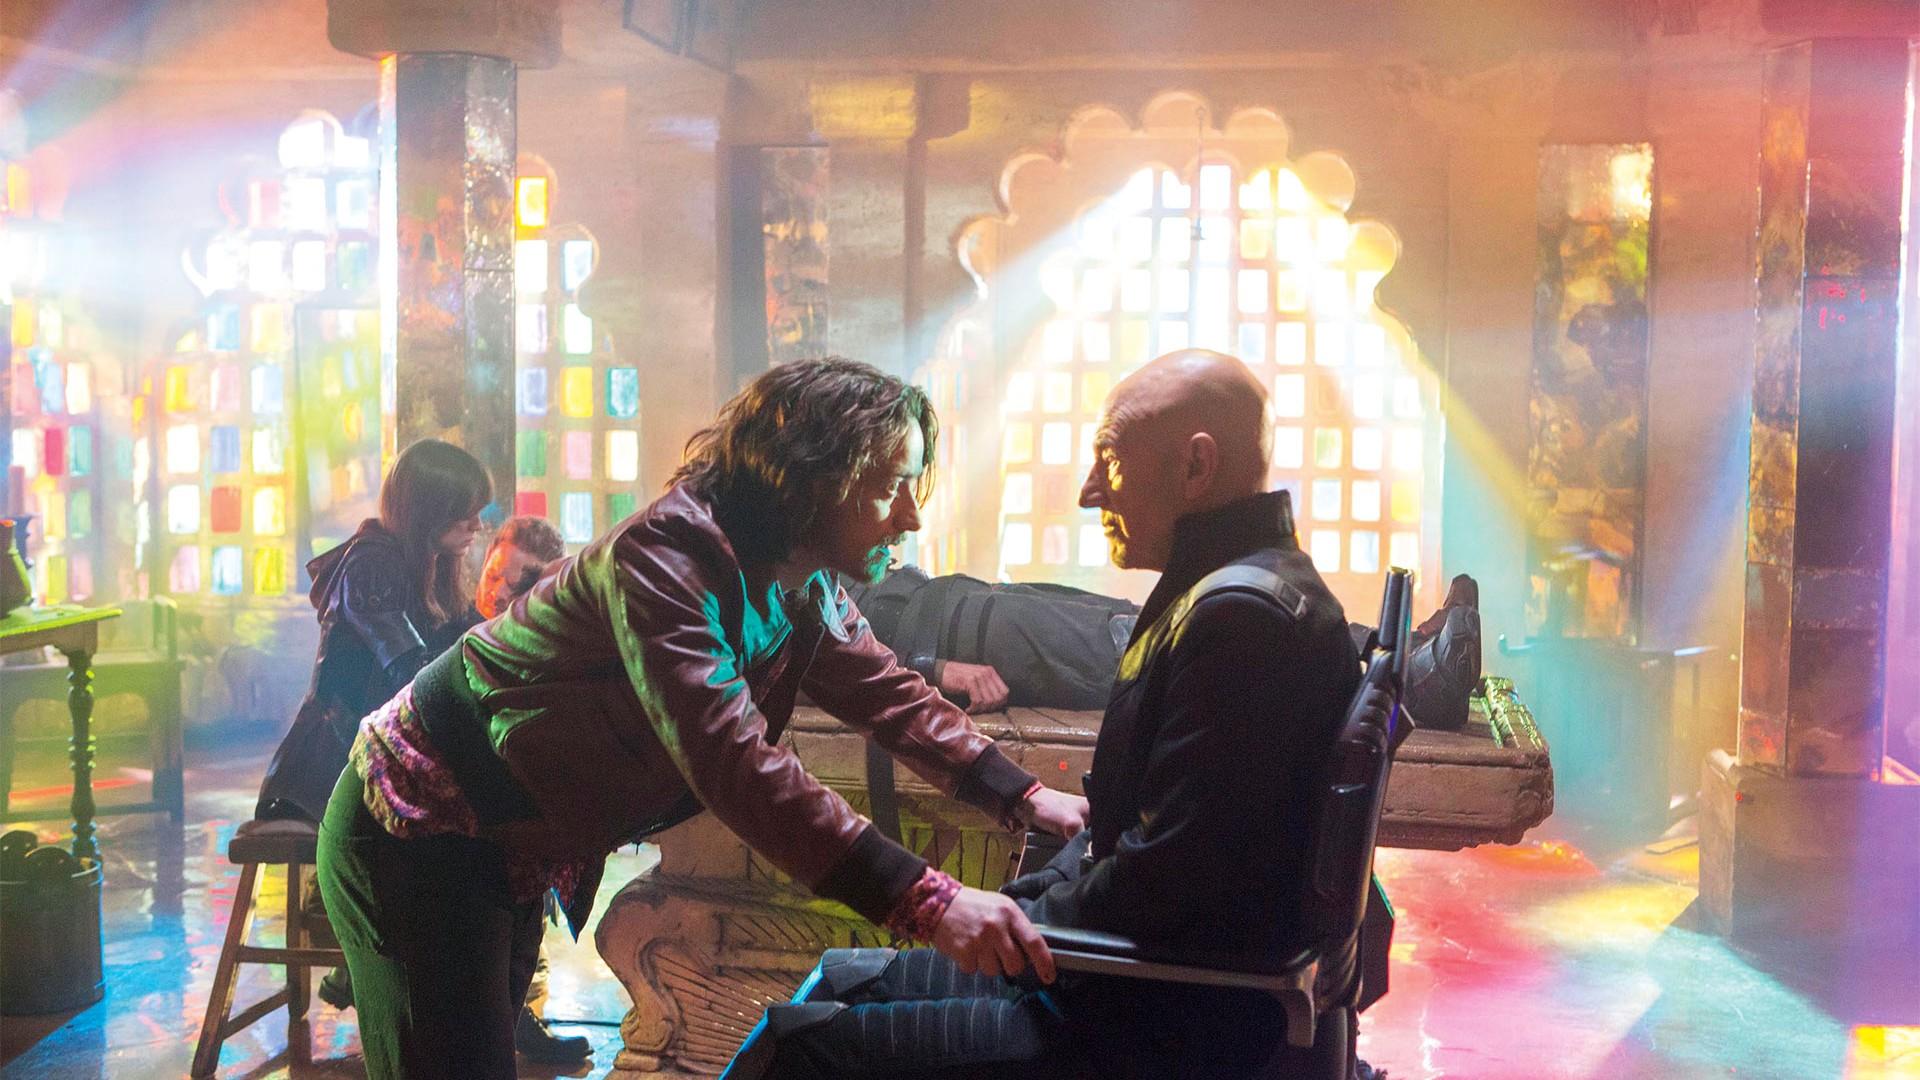 James McAvoy and Sir Patrick Stewart have both played Professor Charles Xavier in X-Men